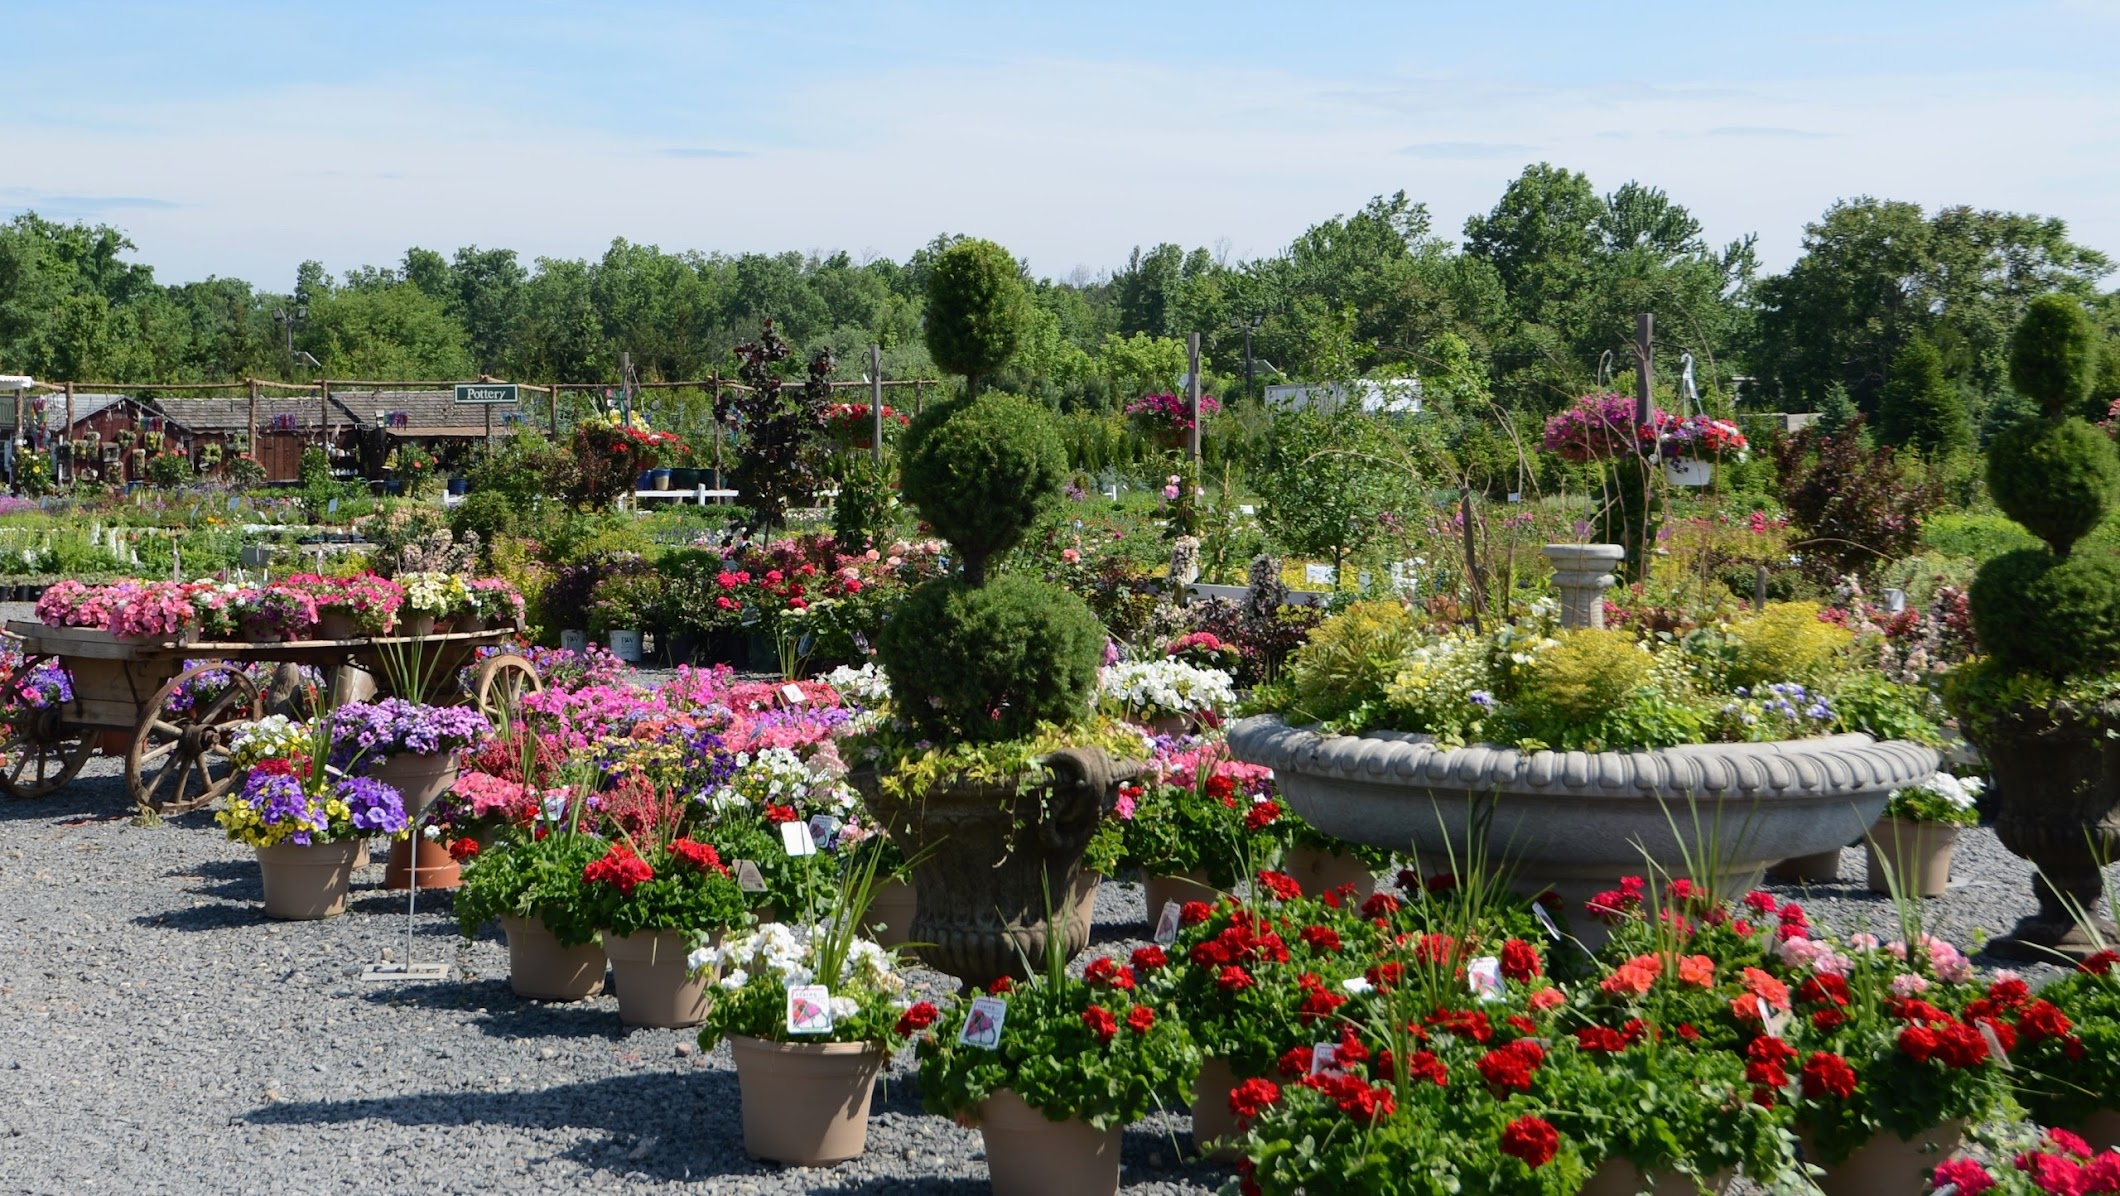 Bountiful Gardens